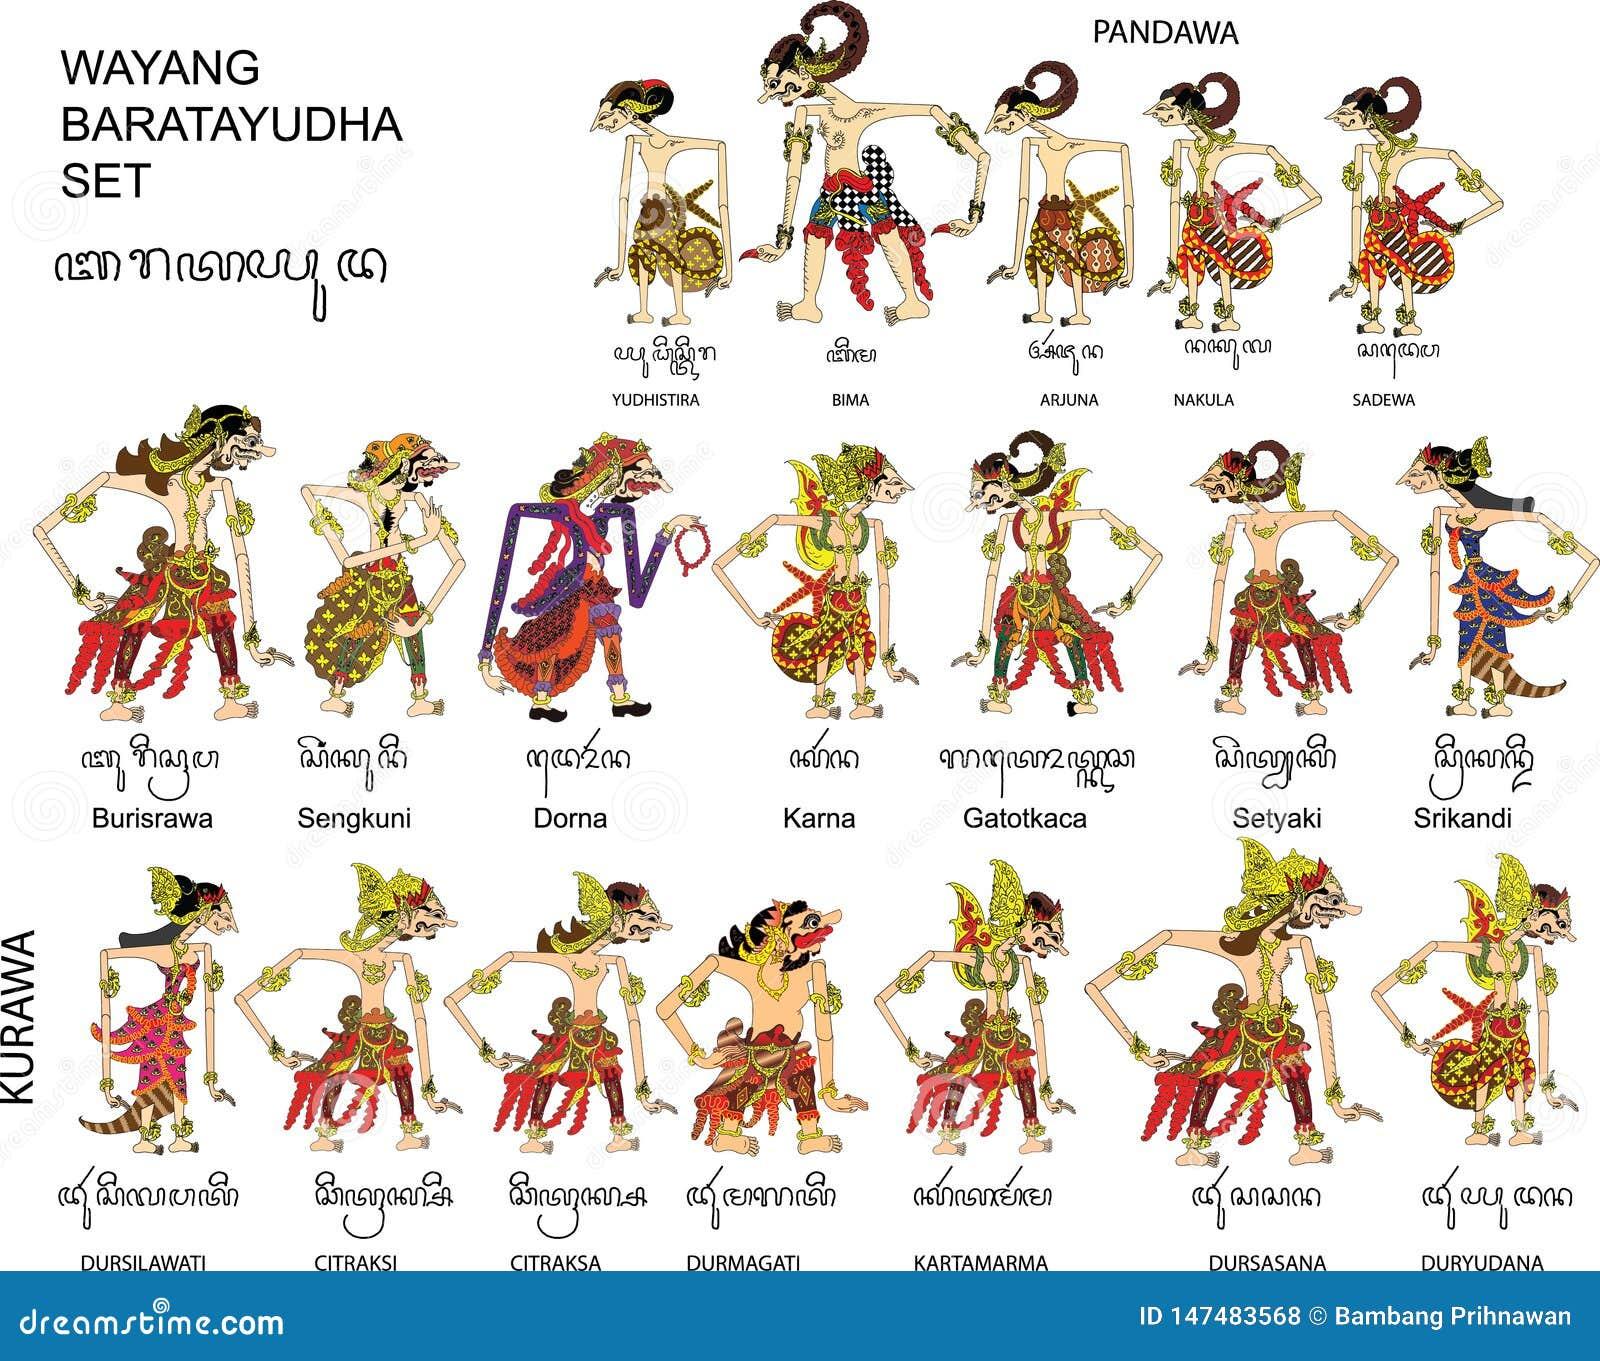 Wayang Baratayuda Set Mahabharata Character Indonesian